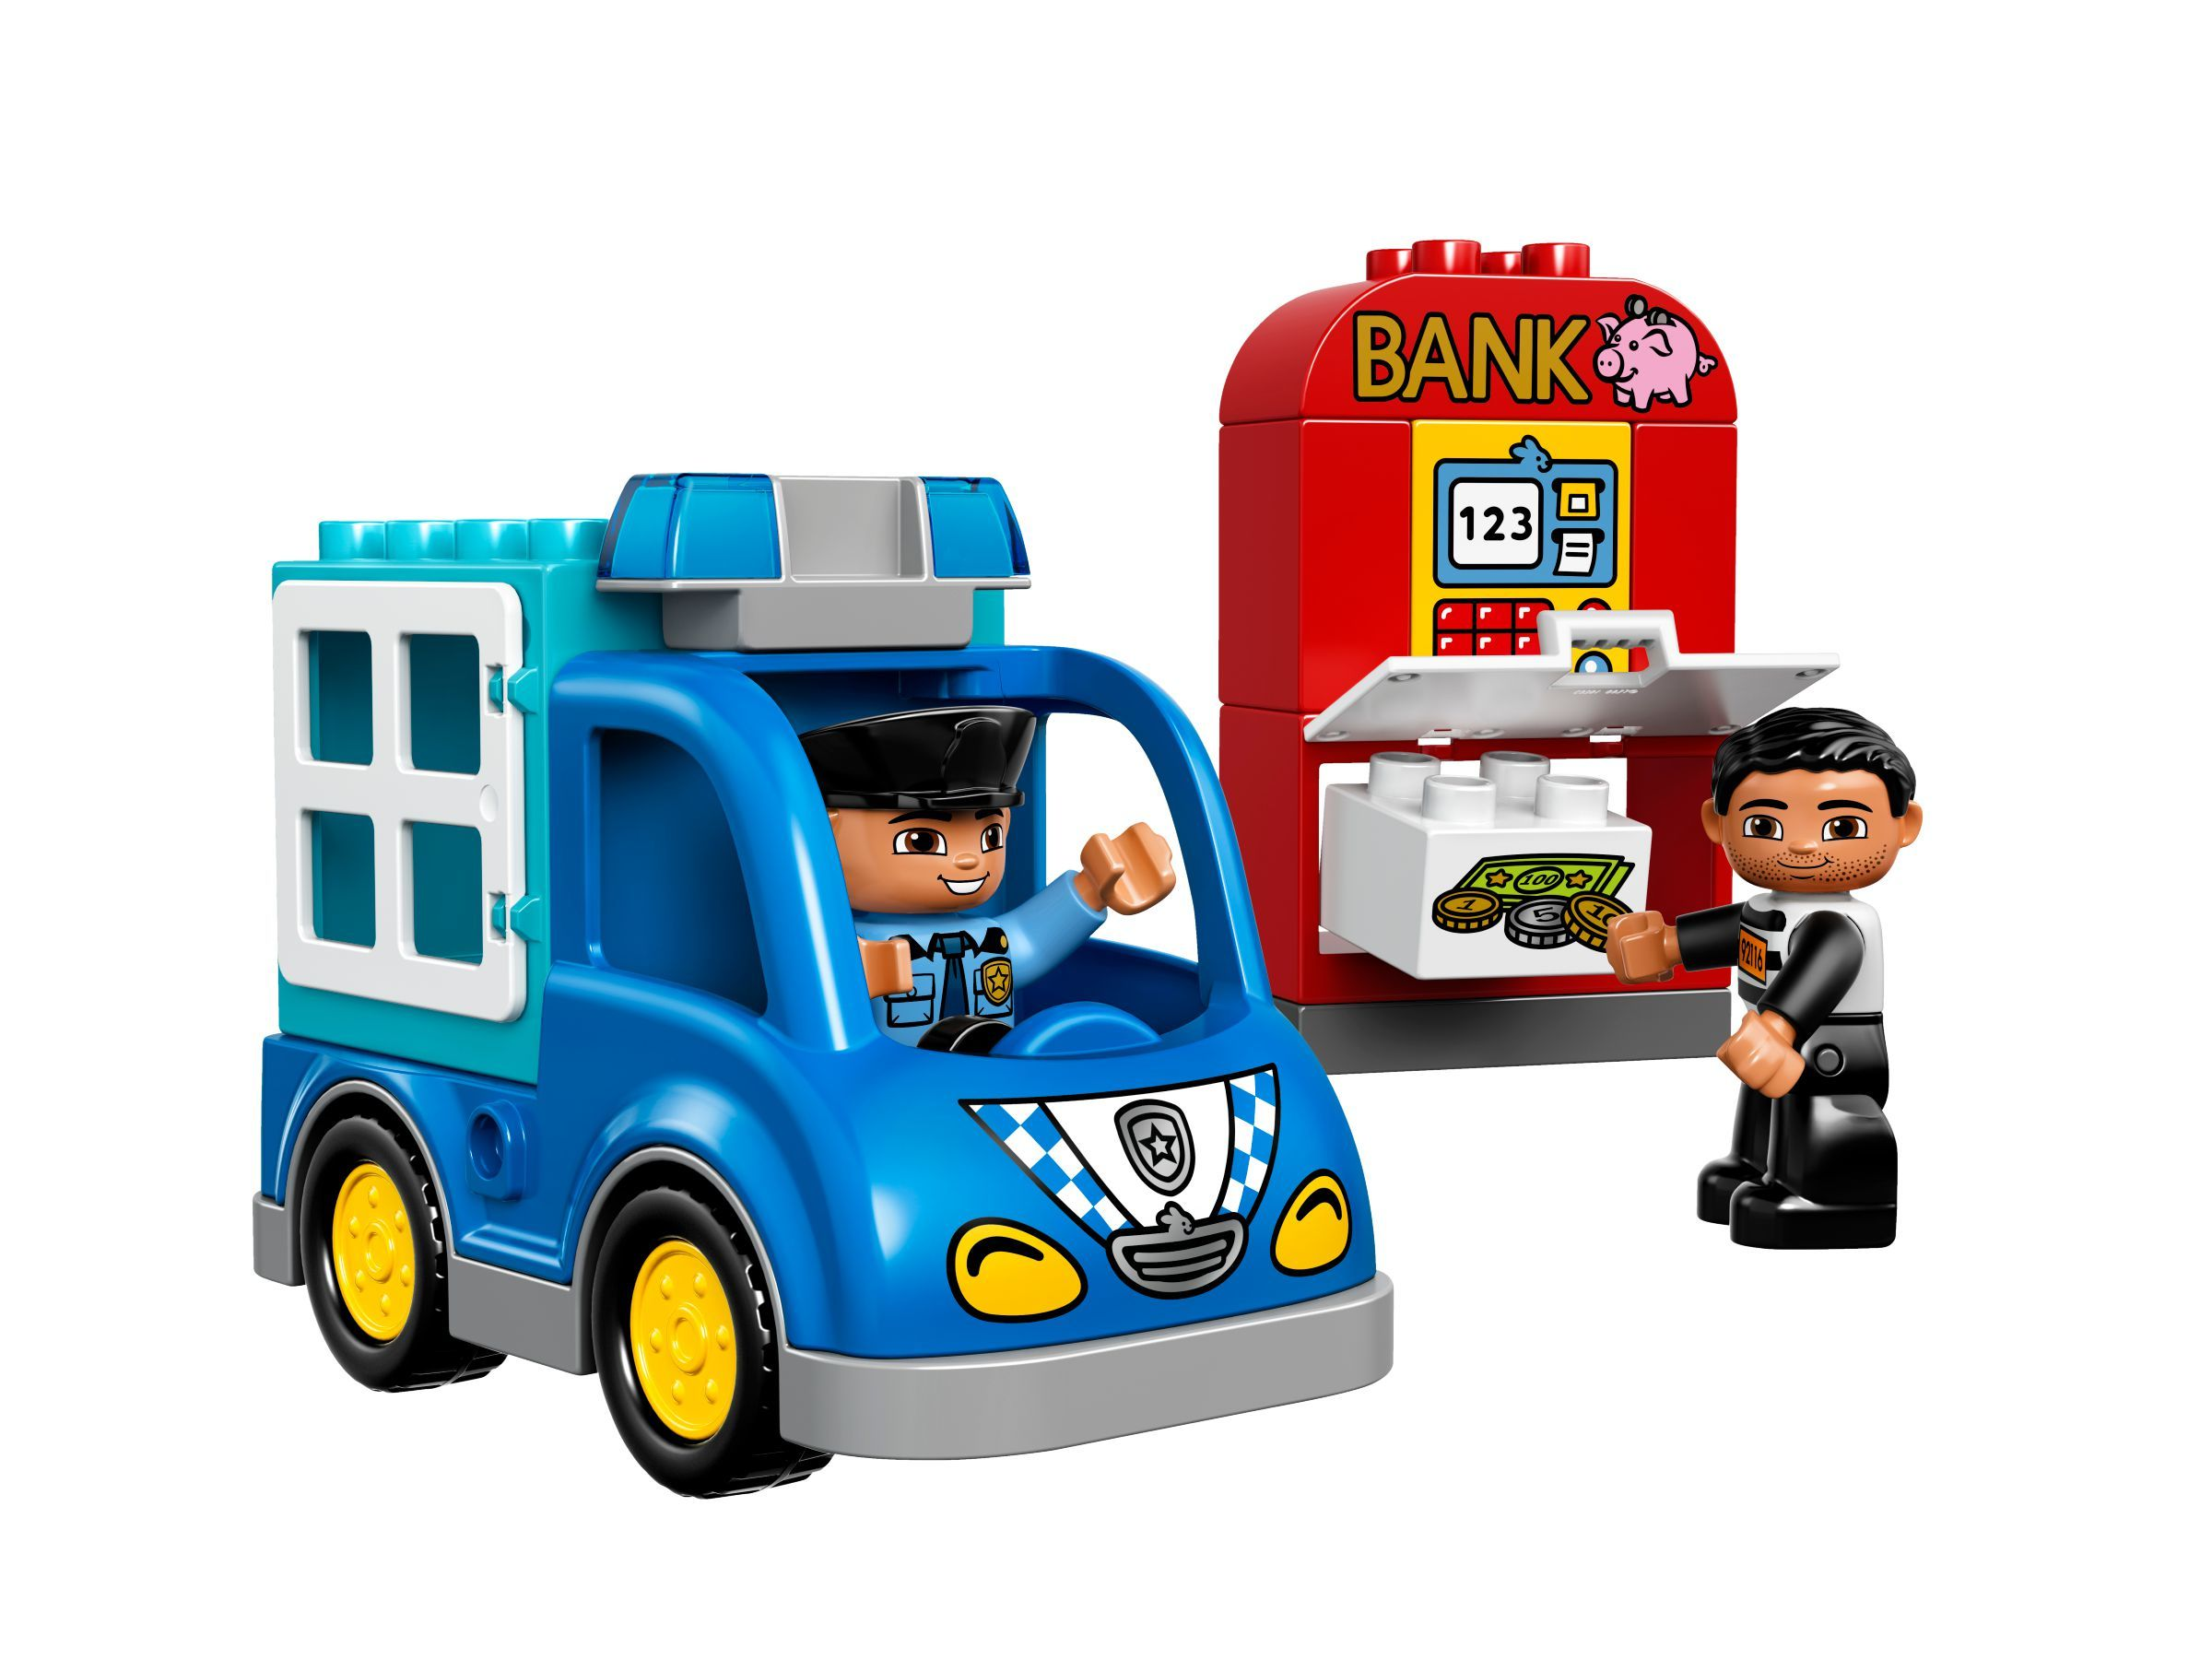 La patrouille de police - 10809